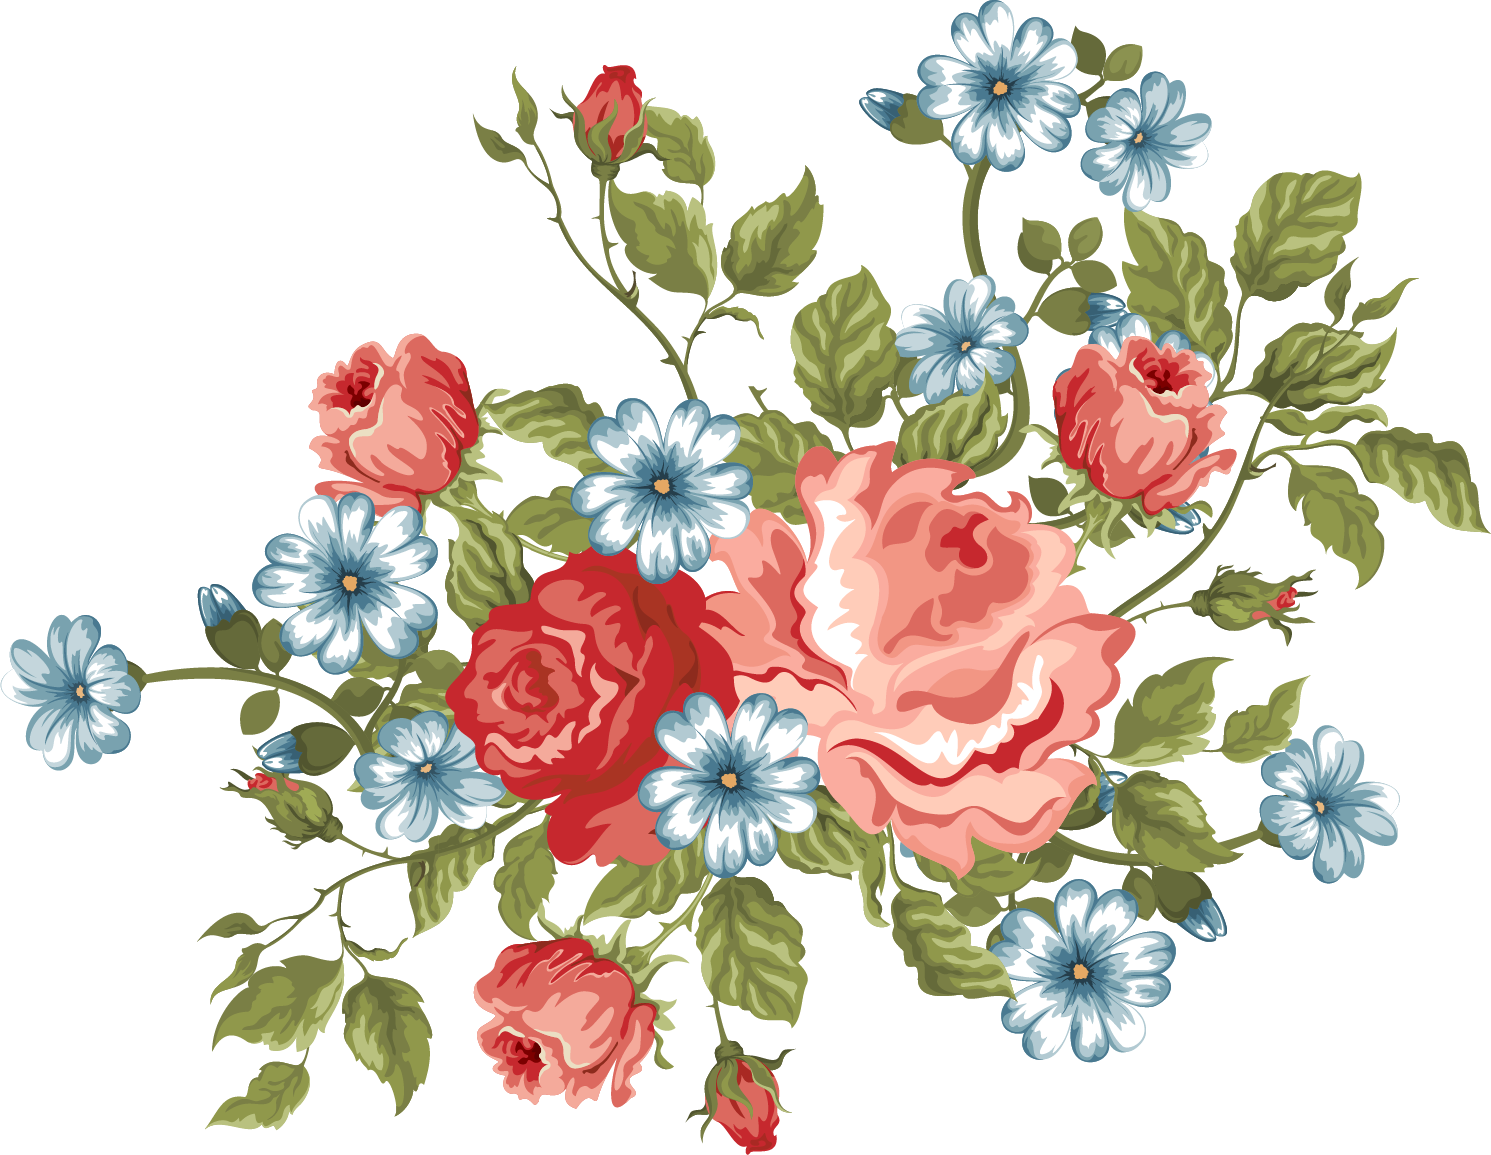 Flowers xxl designs pinterest. Vintage flower png